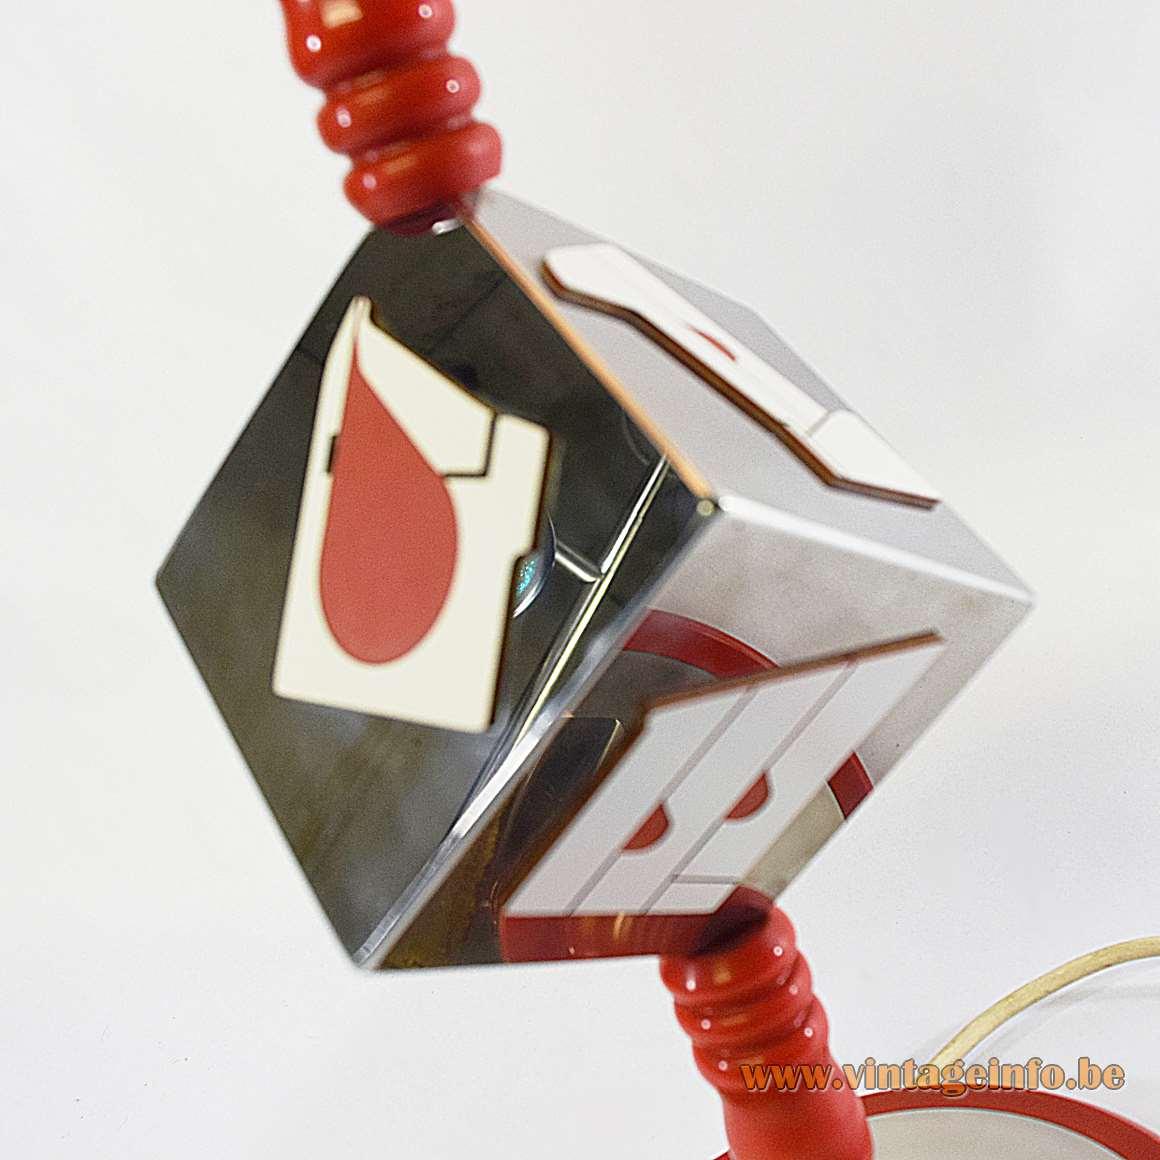 Diamond Cutting Early Retirement Table Lamp